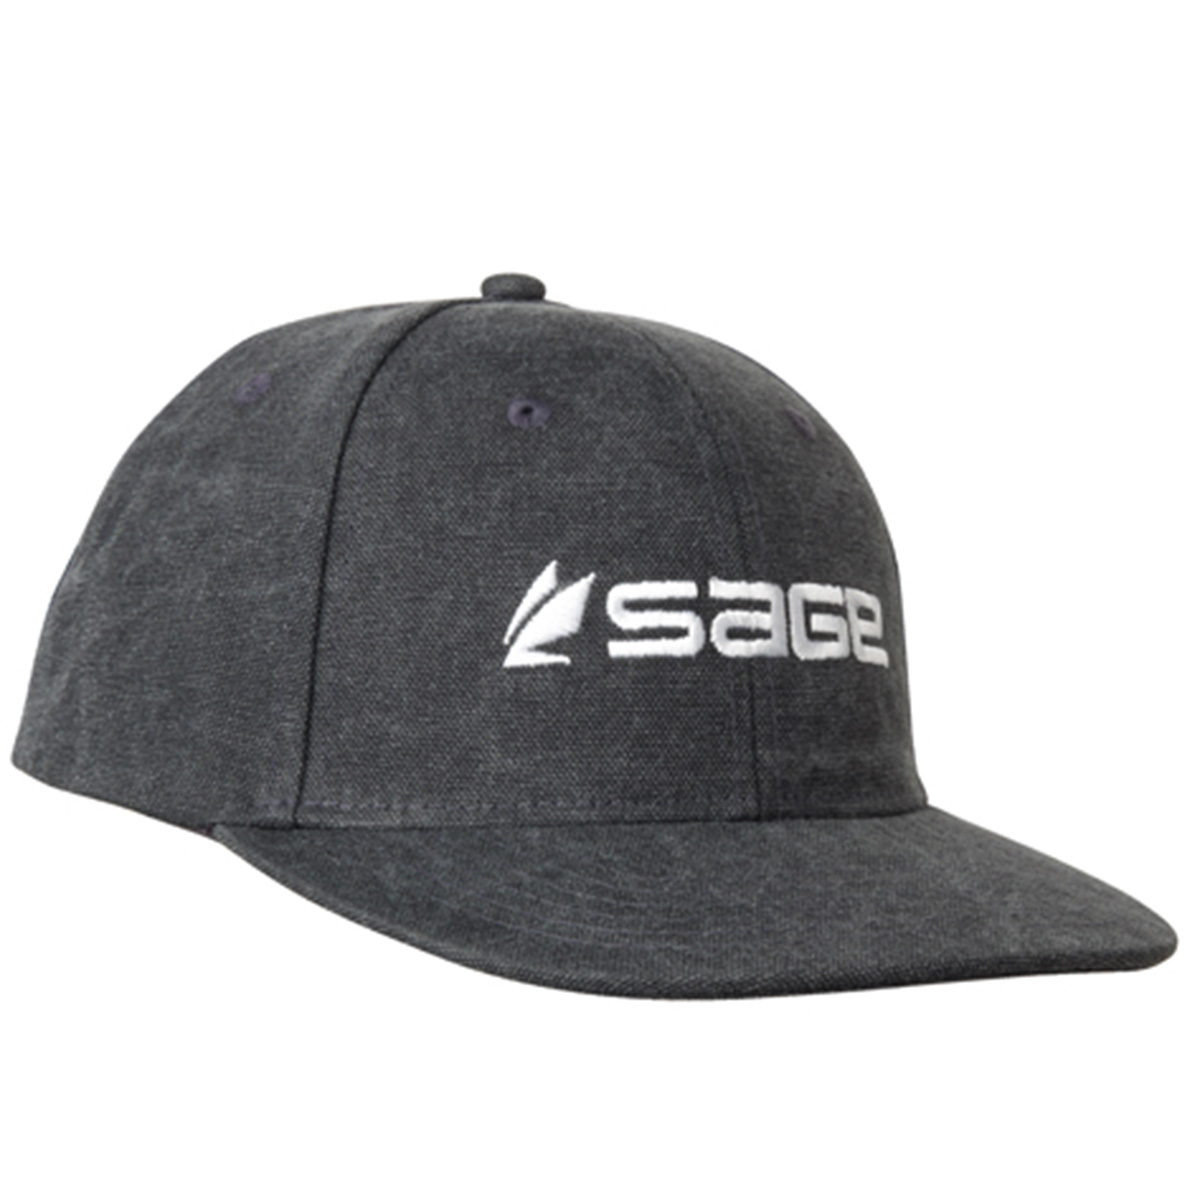 Charocoal Code  10068302 Sage Drift Hat 2588fbcbcb2